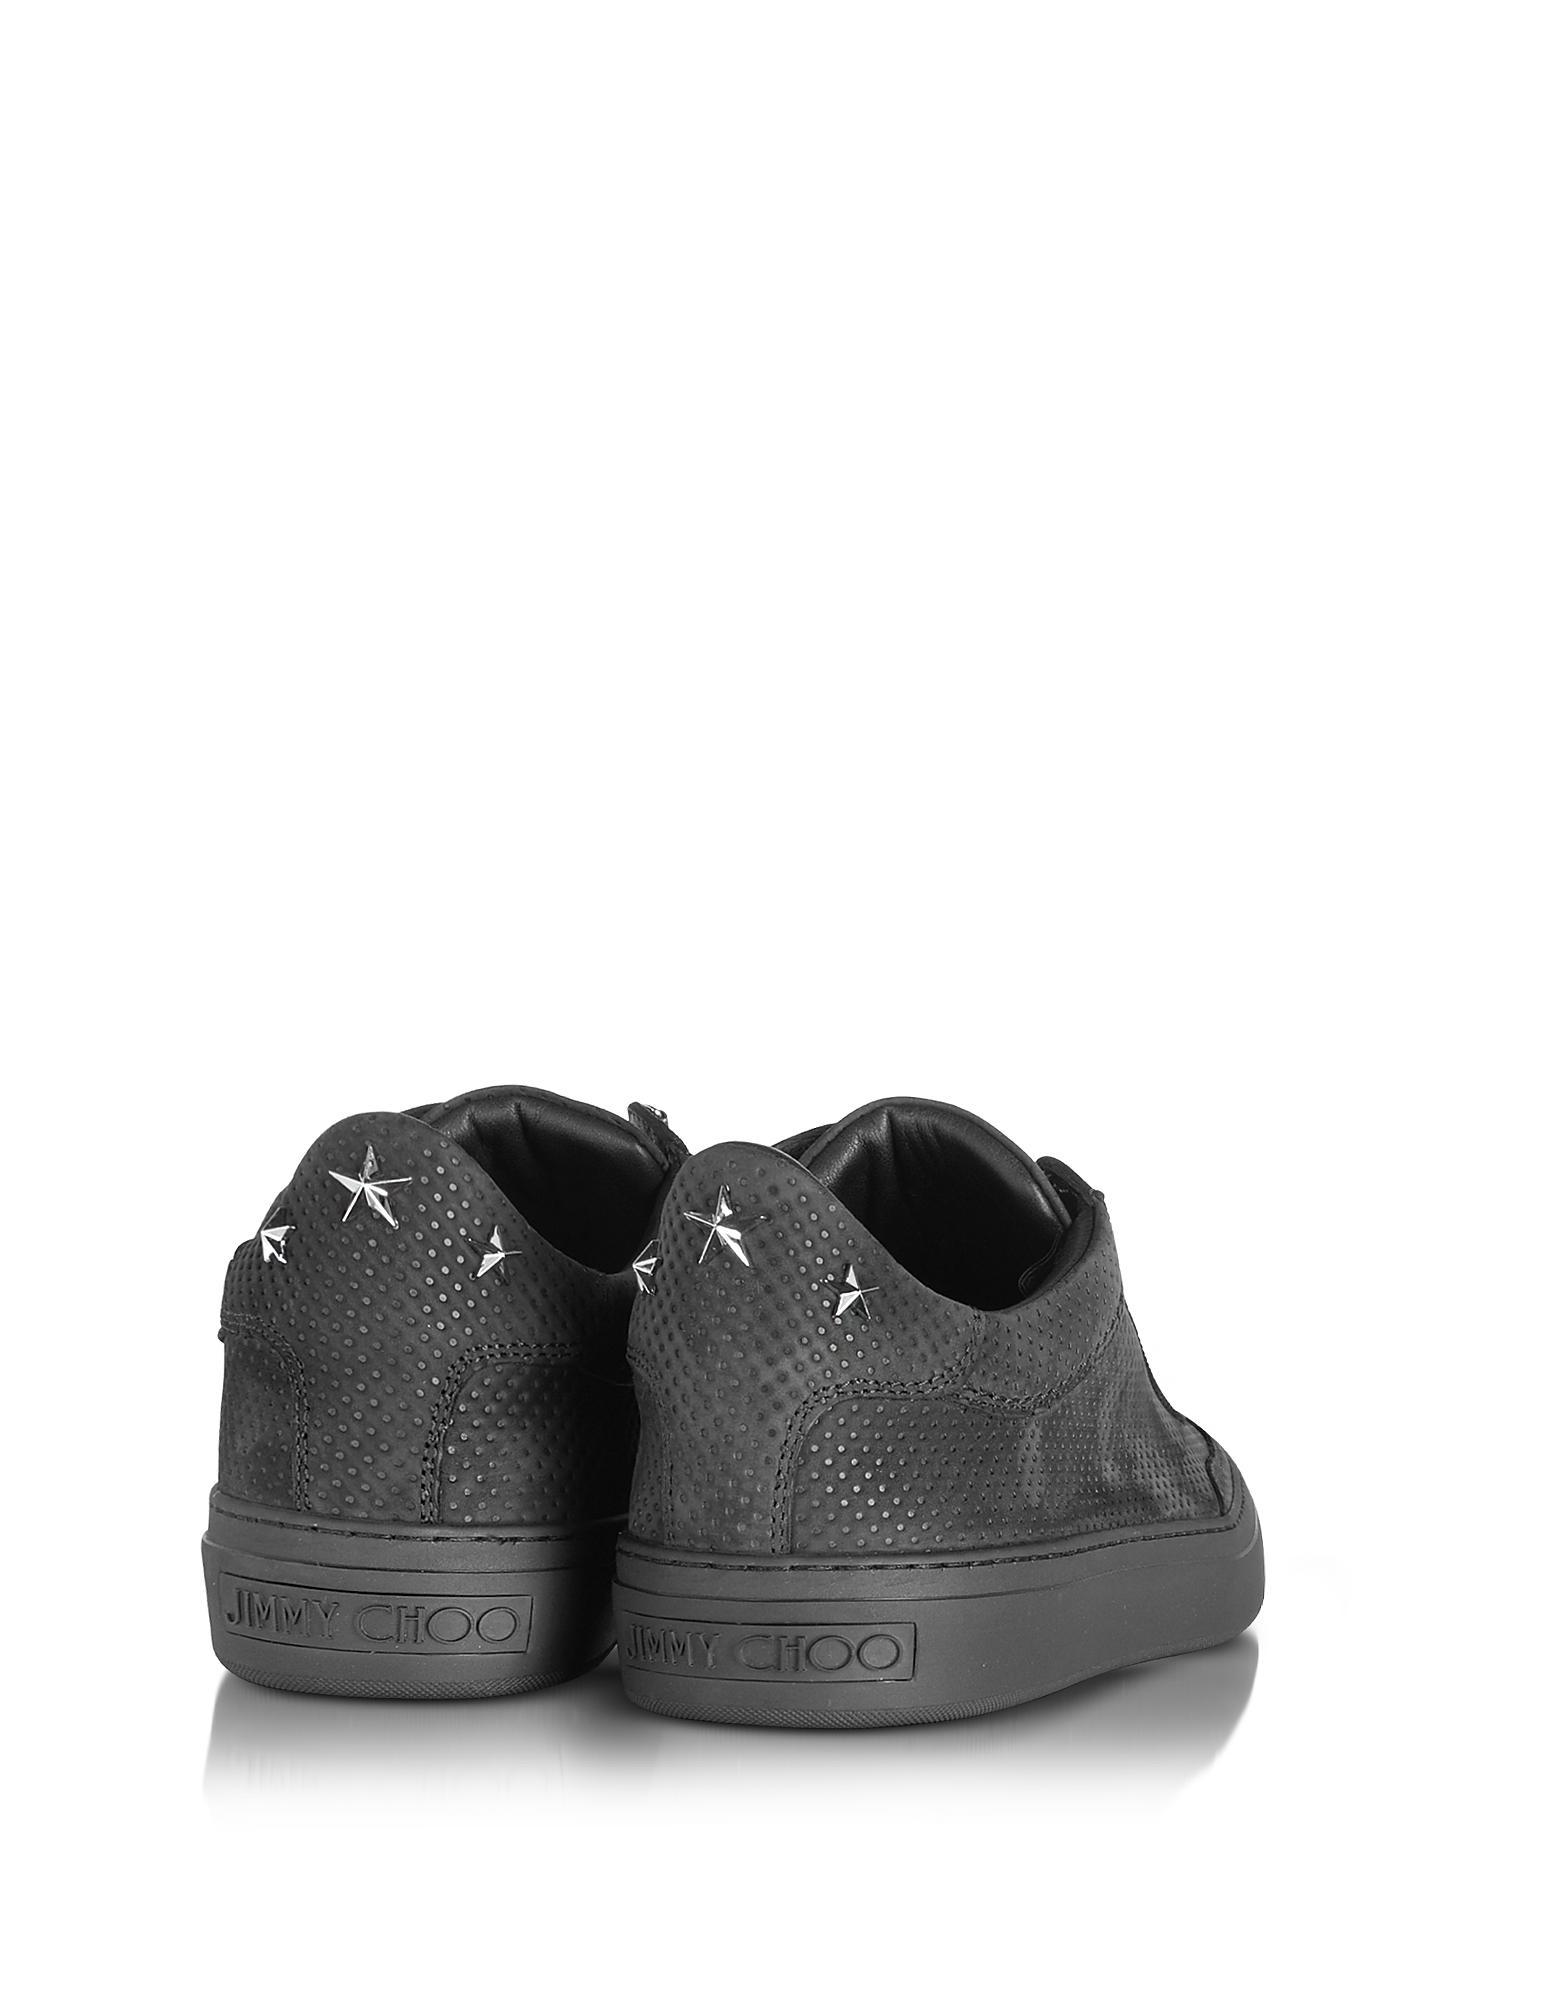 Jimmy Choo Mens Shoes Australia